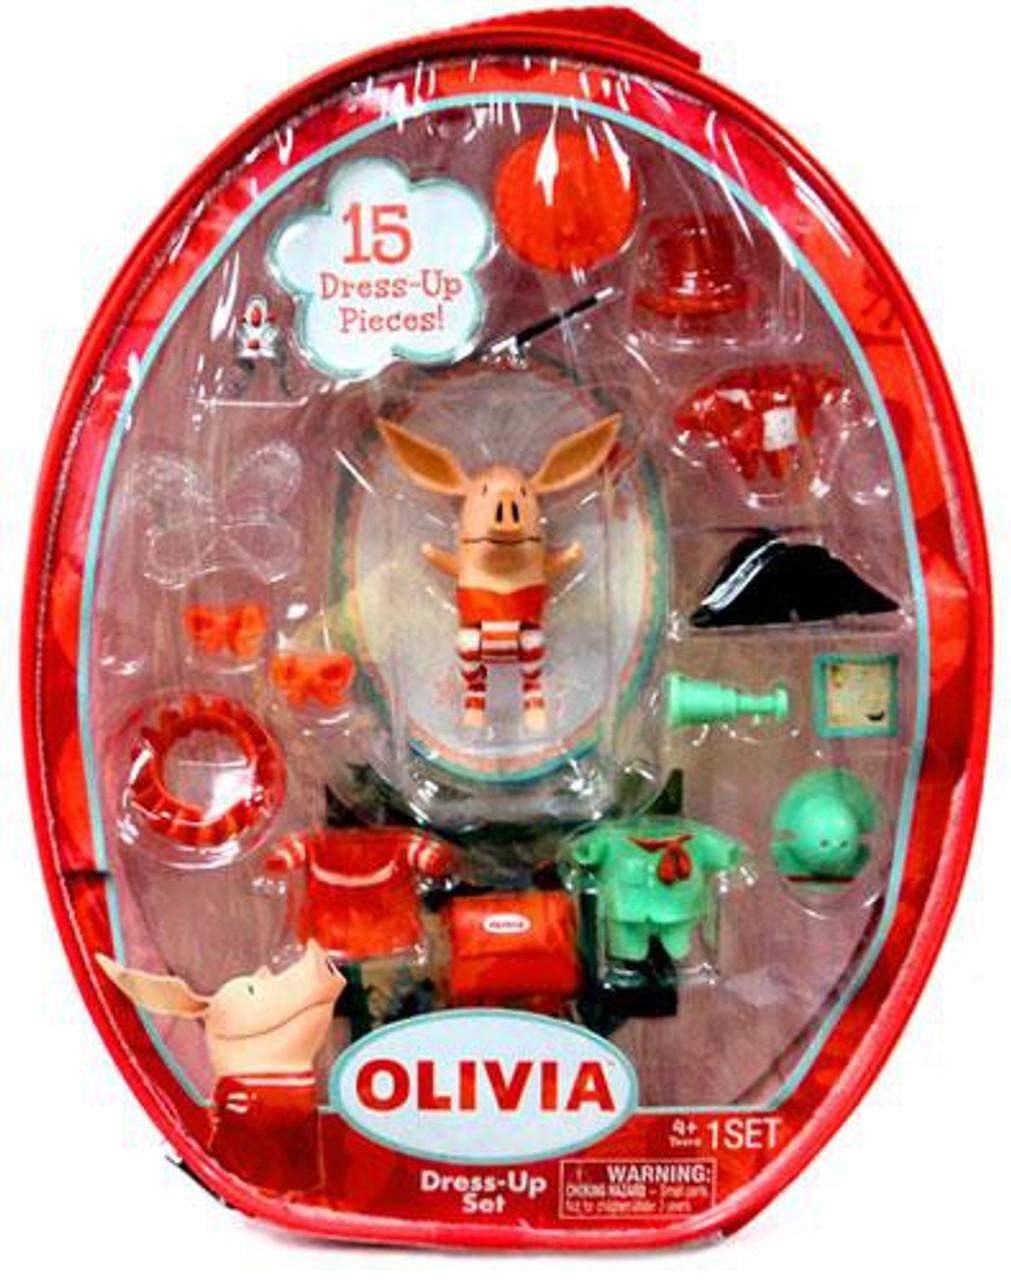 Olivia Dress Up Set 3-Inch